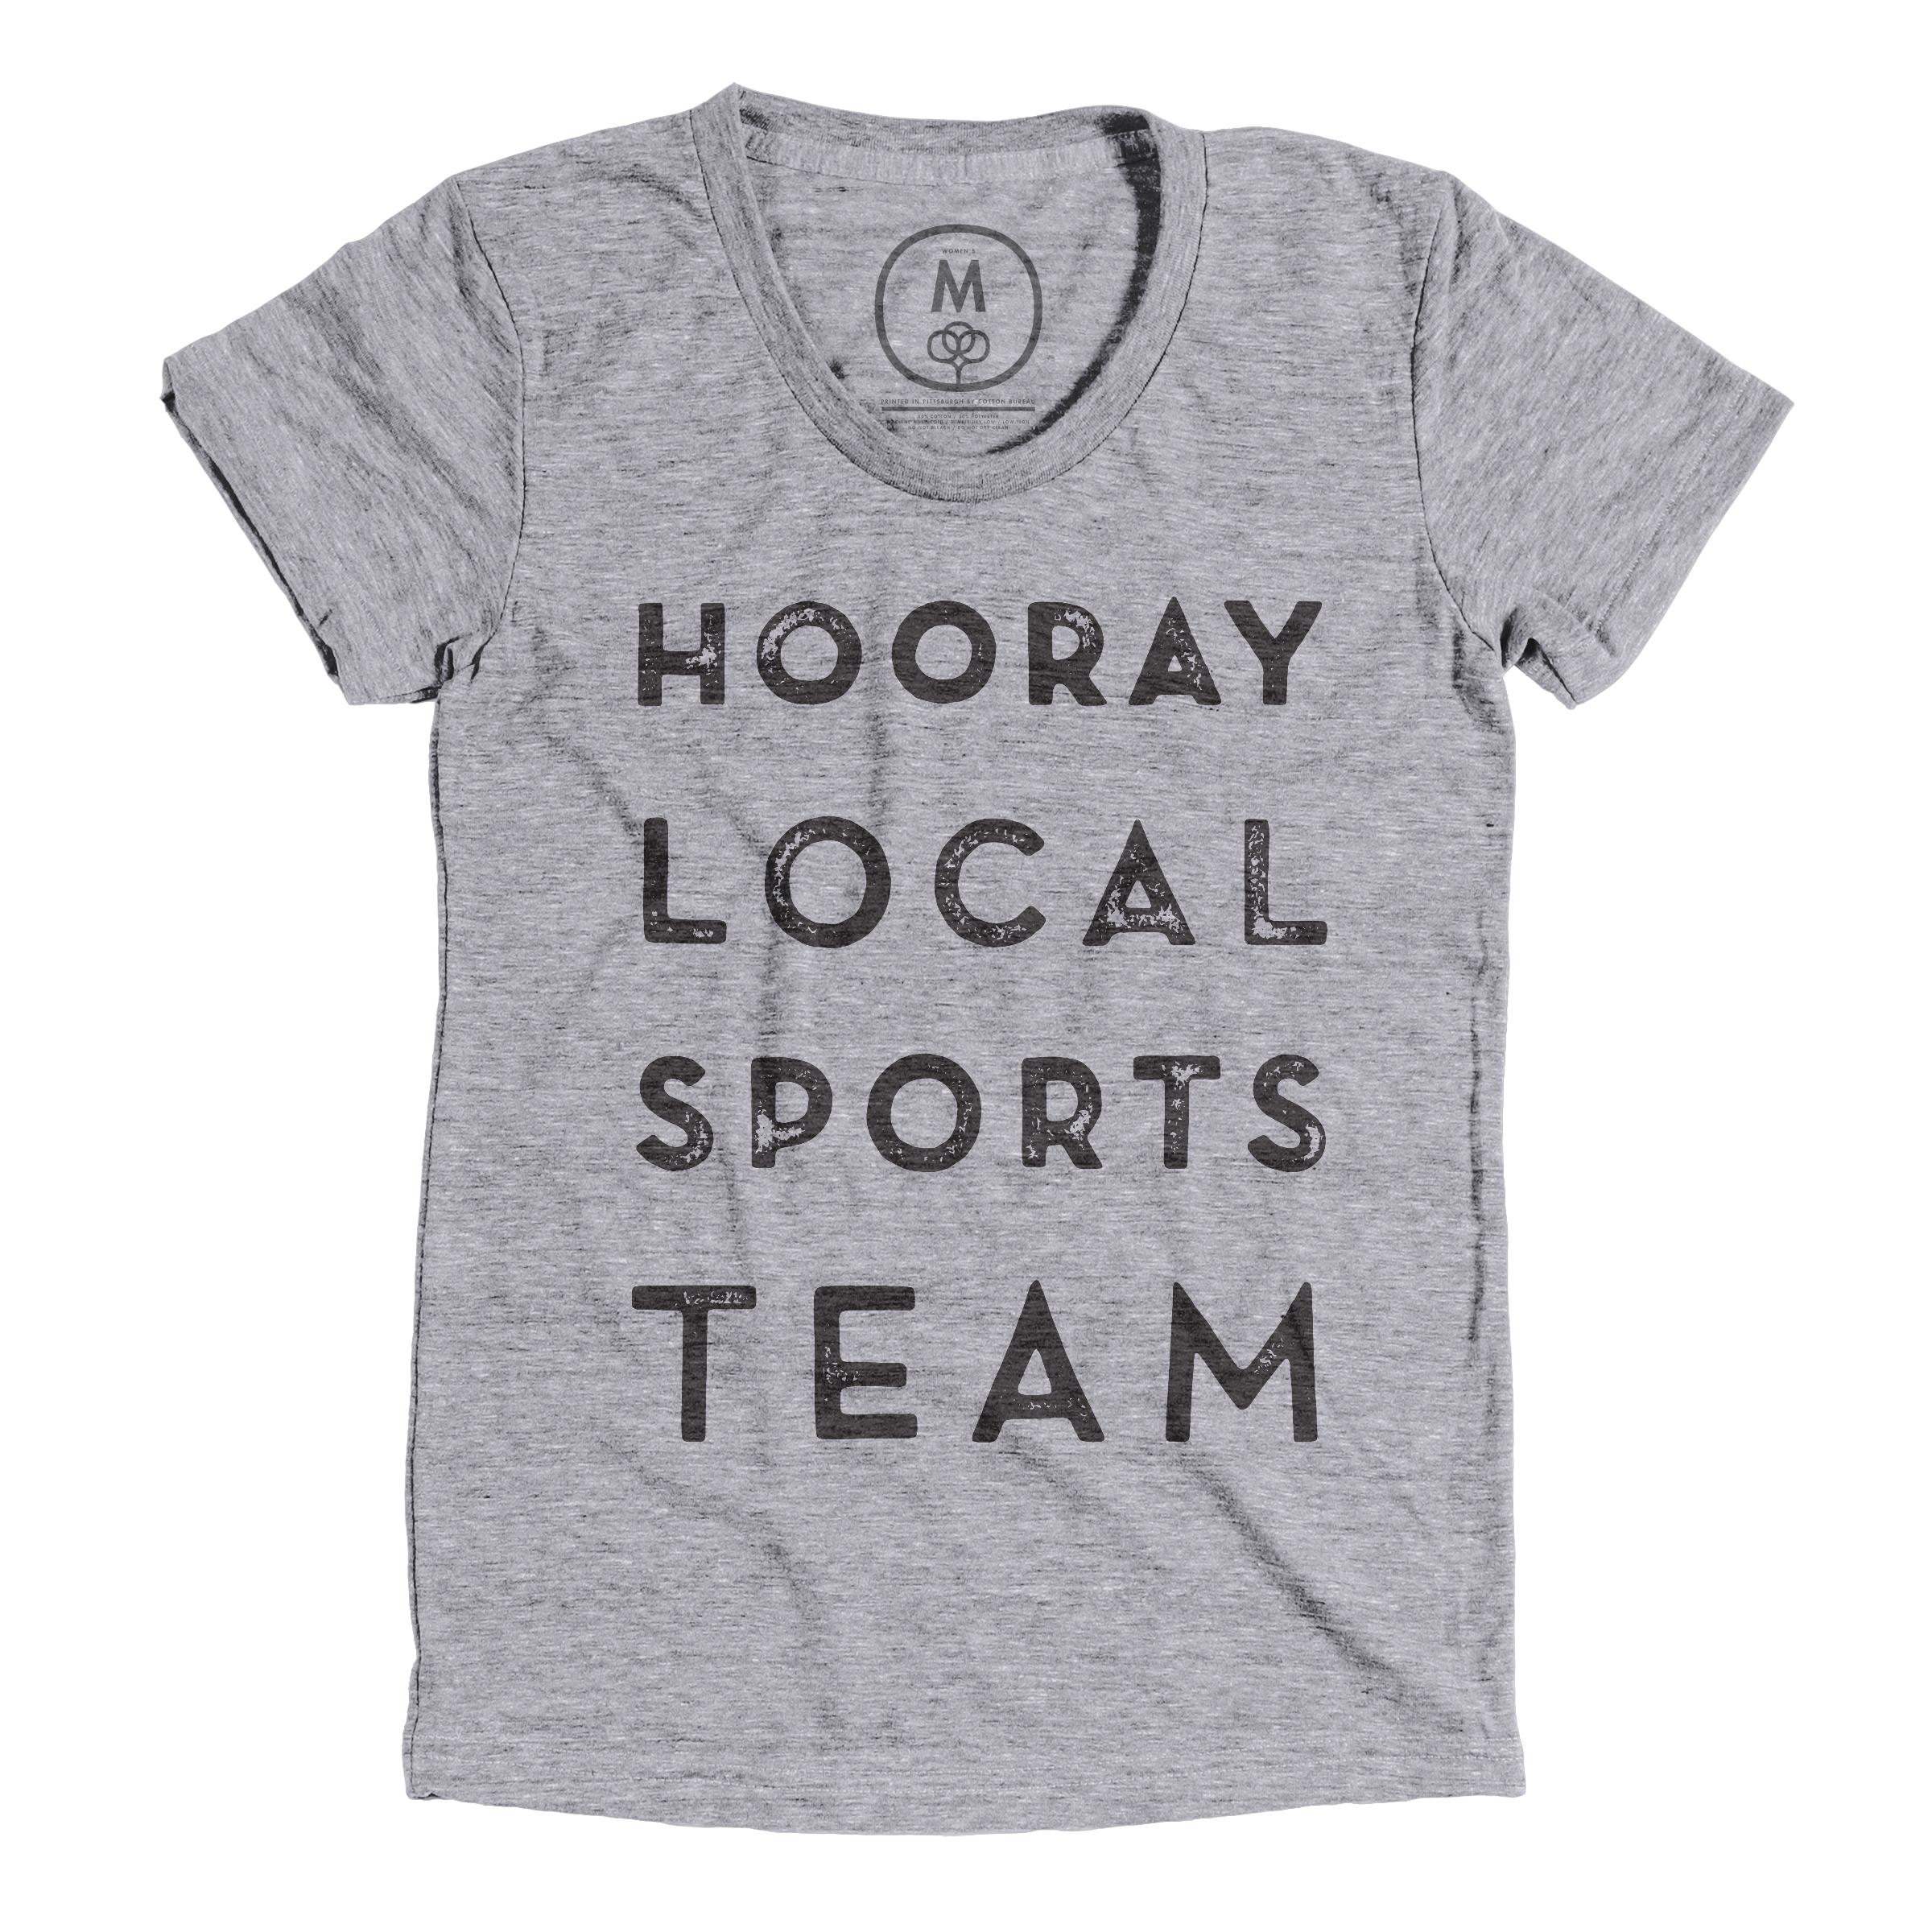 Hooray Local Sports Team Premium Heather (Women's)